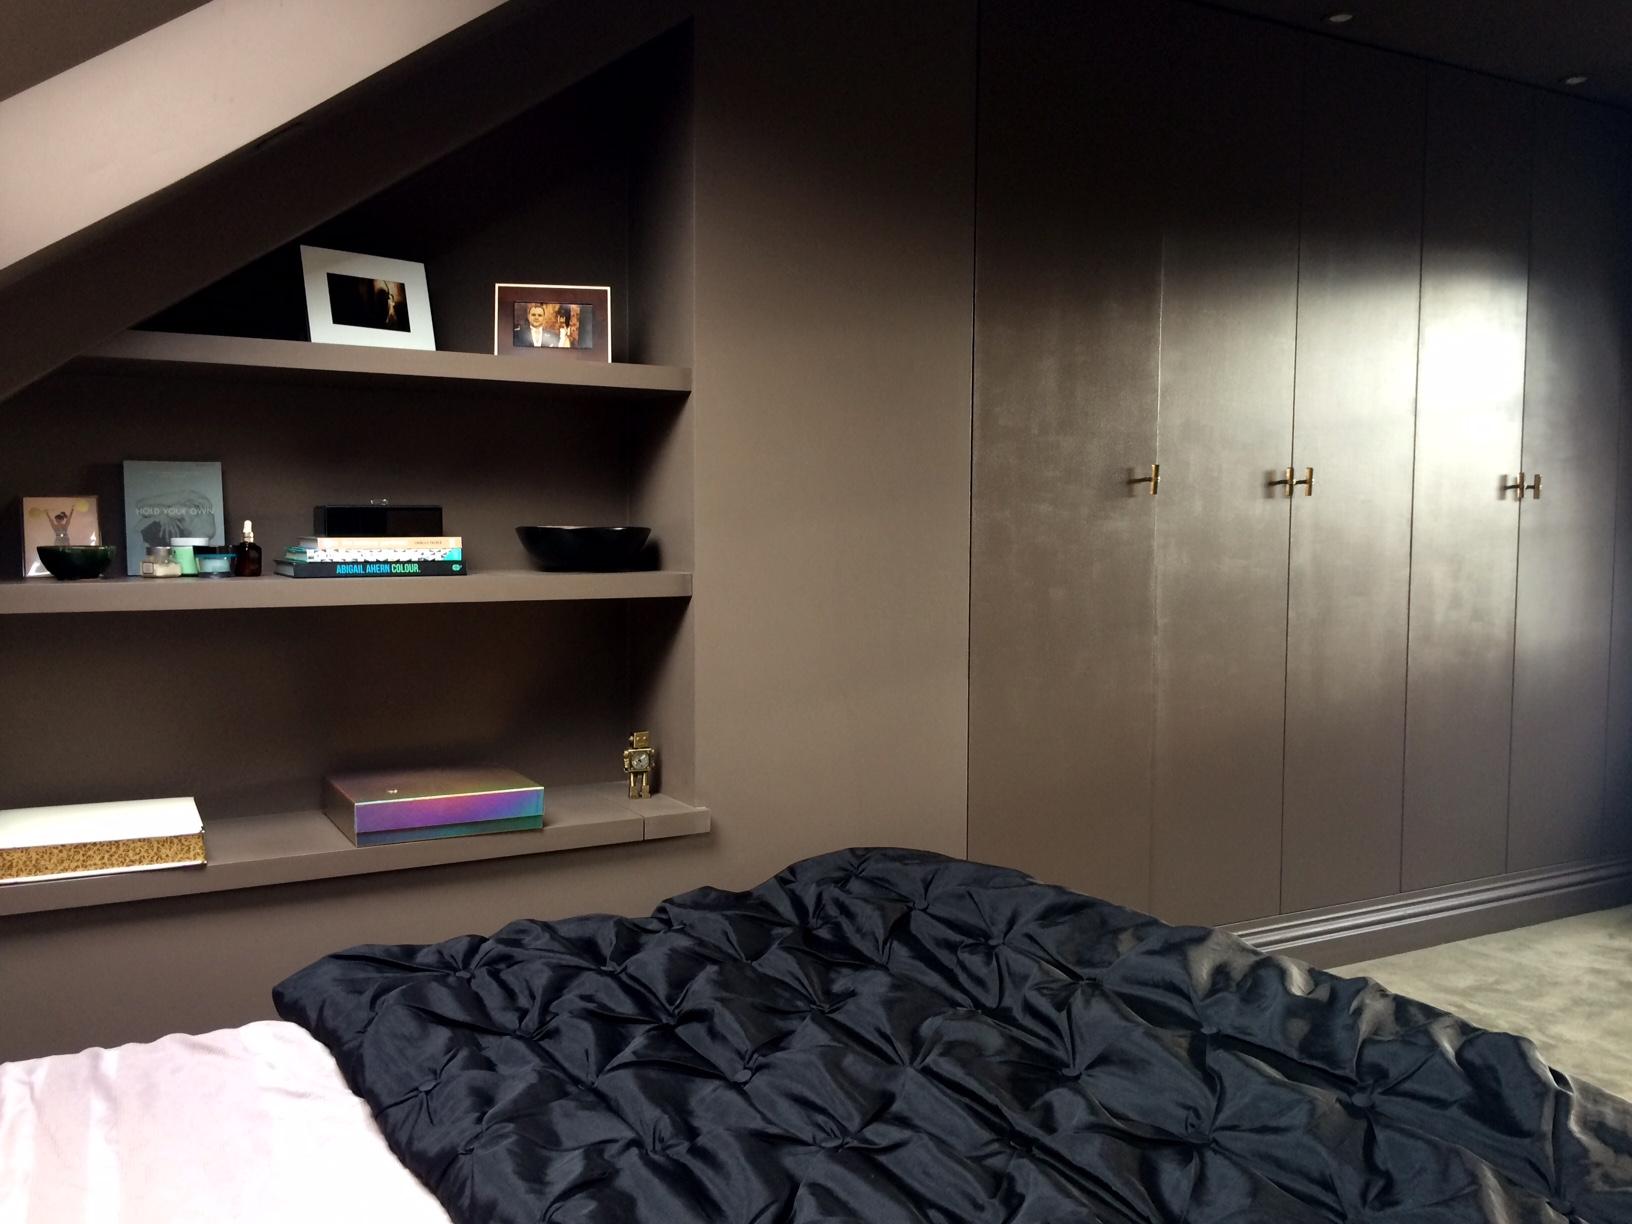 Plan B shelves with secret storage underneath